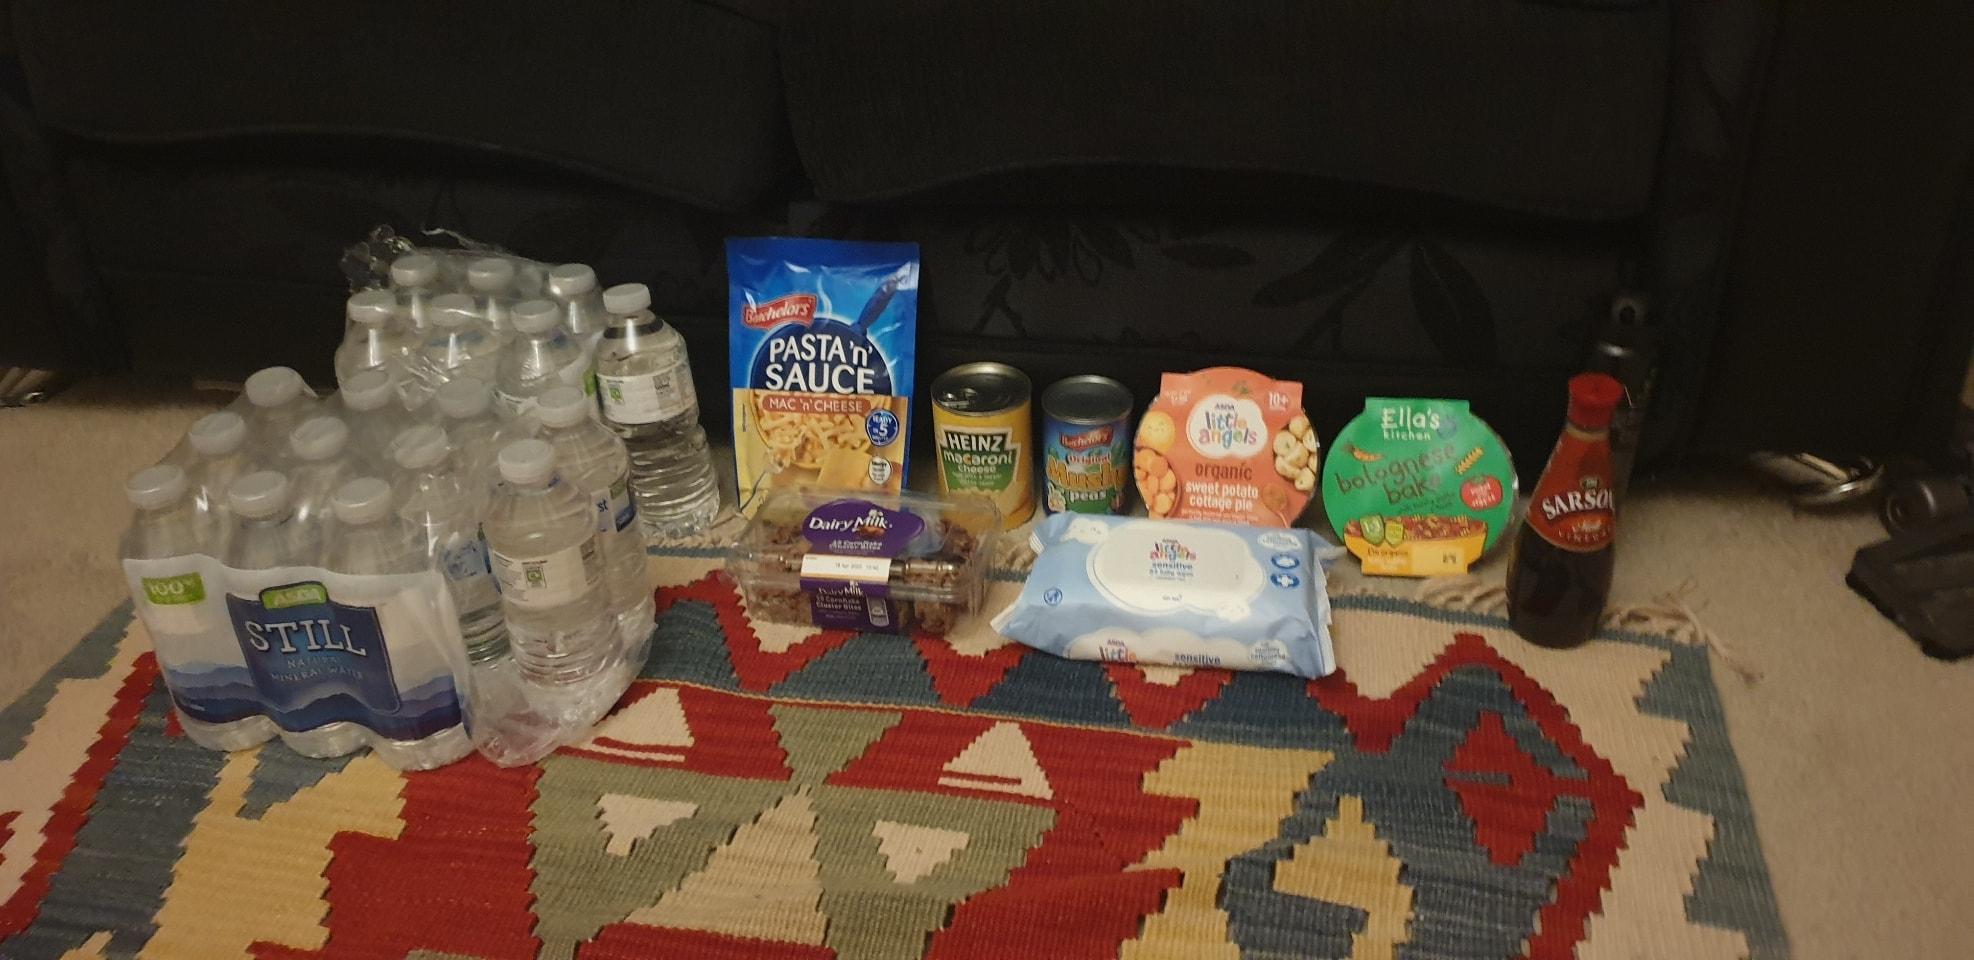 Last few items remaing before lockdown.